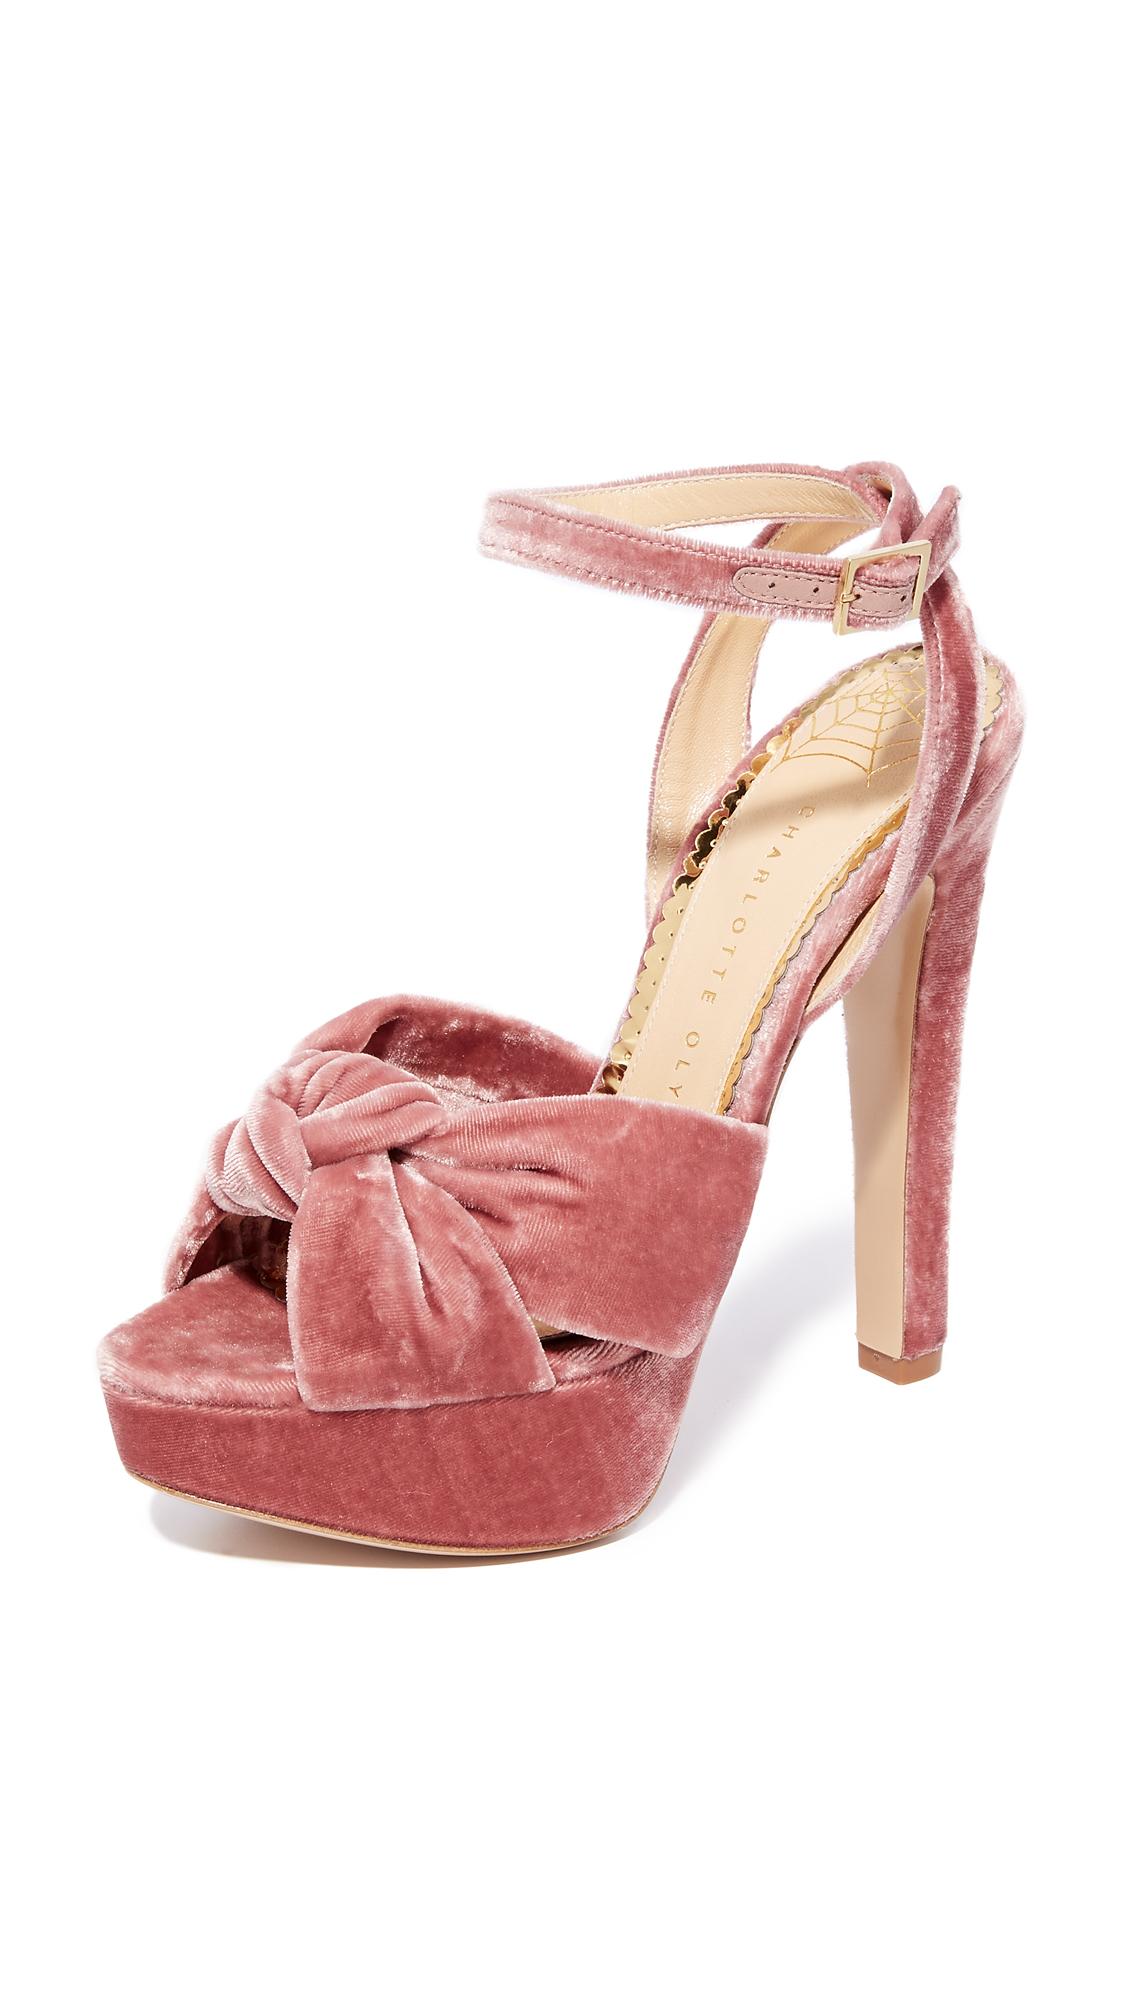 Charlotte Olympia Tiffani Ankle Strap Pumps - Blush